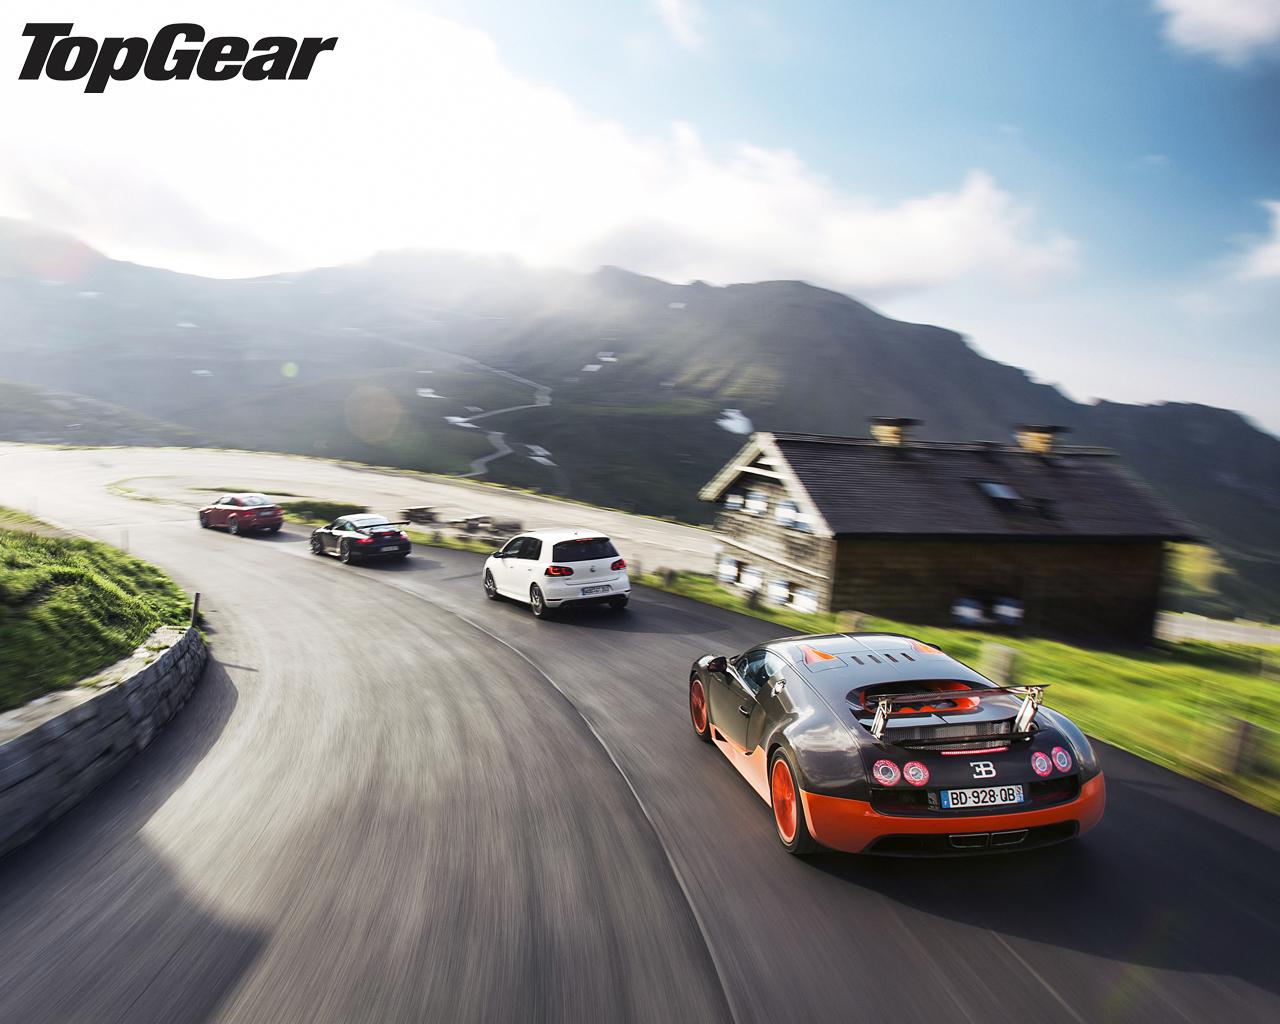 download picture at 1024x1280 - Bugatti Veyron Super Sport Top Gear Wallpaper